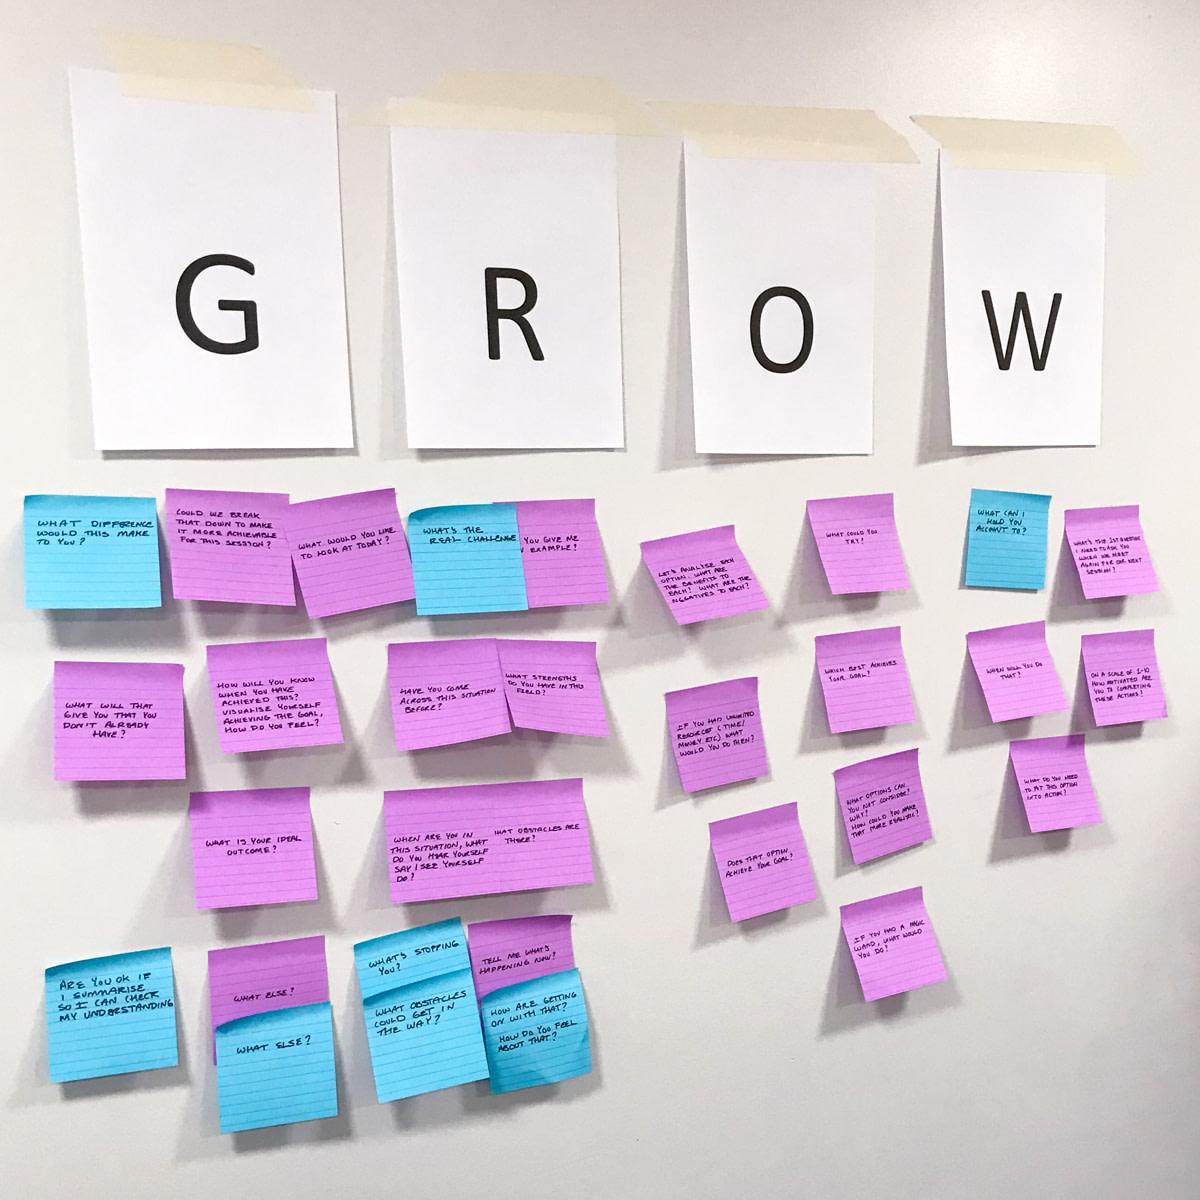 fiona flemington Grow Notes 1